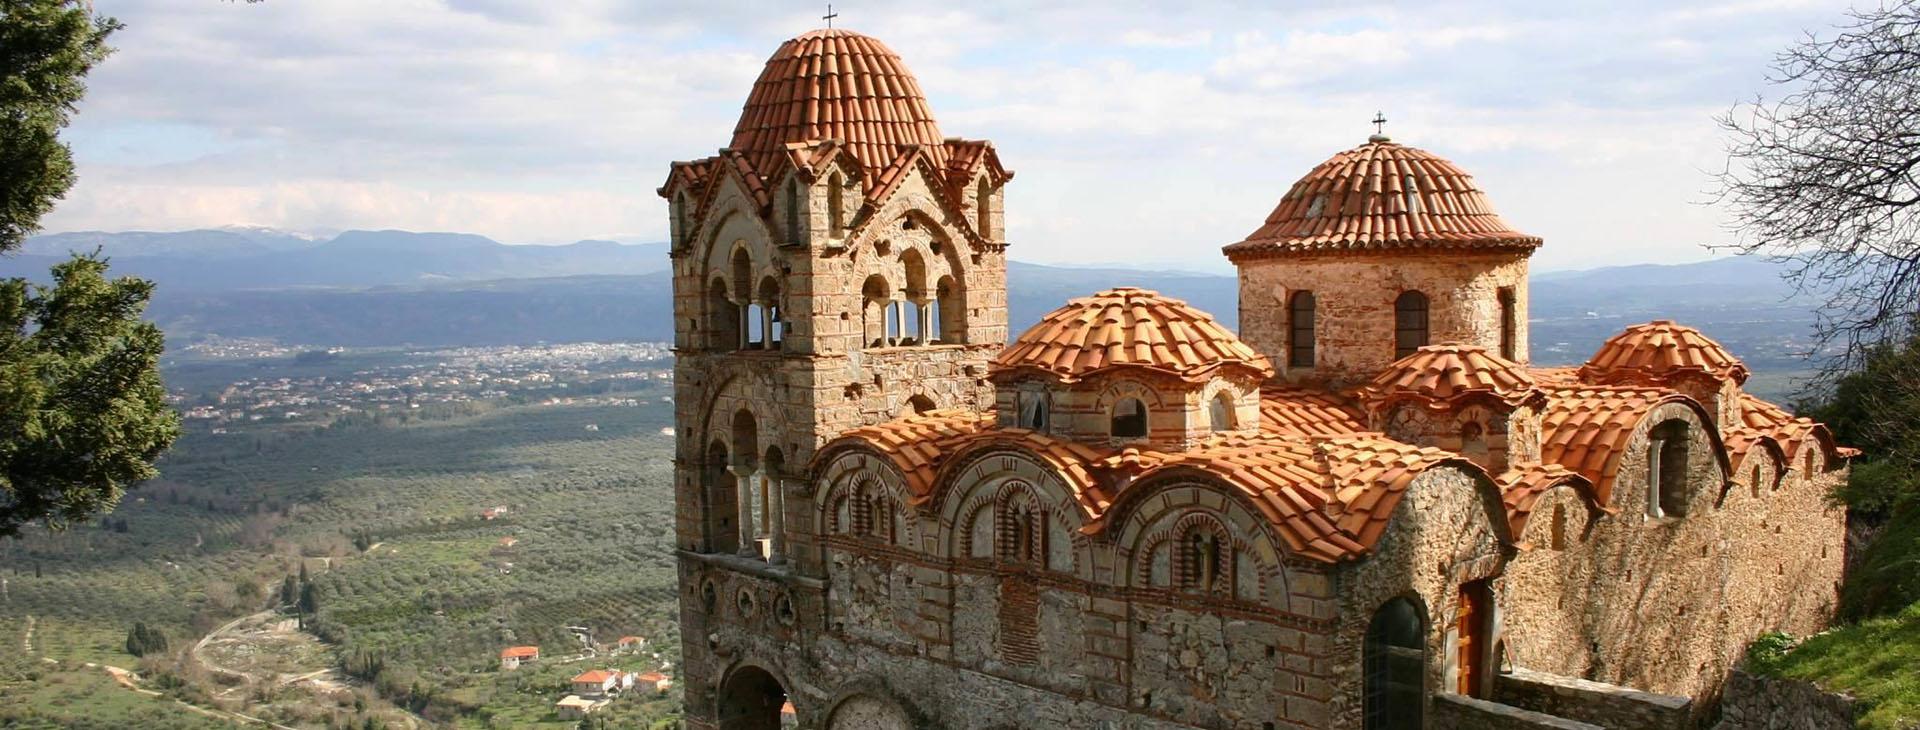 Mystras, Church of Agia Sophia, Lakonia